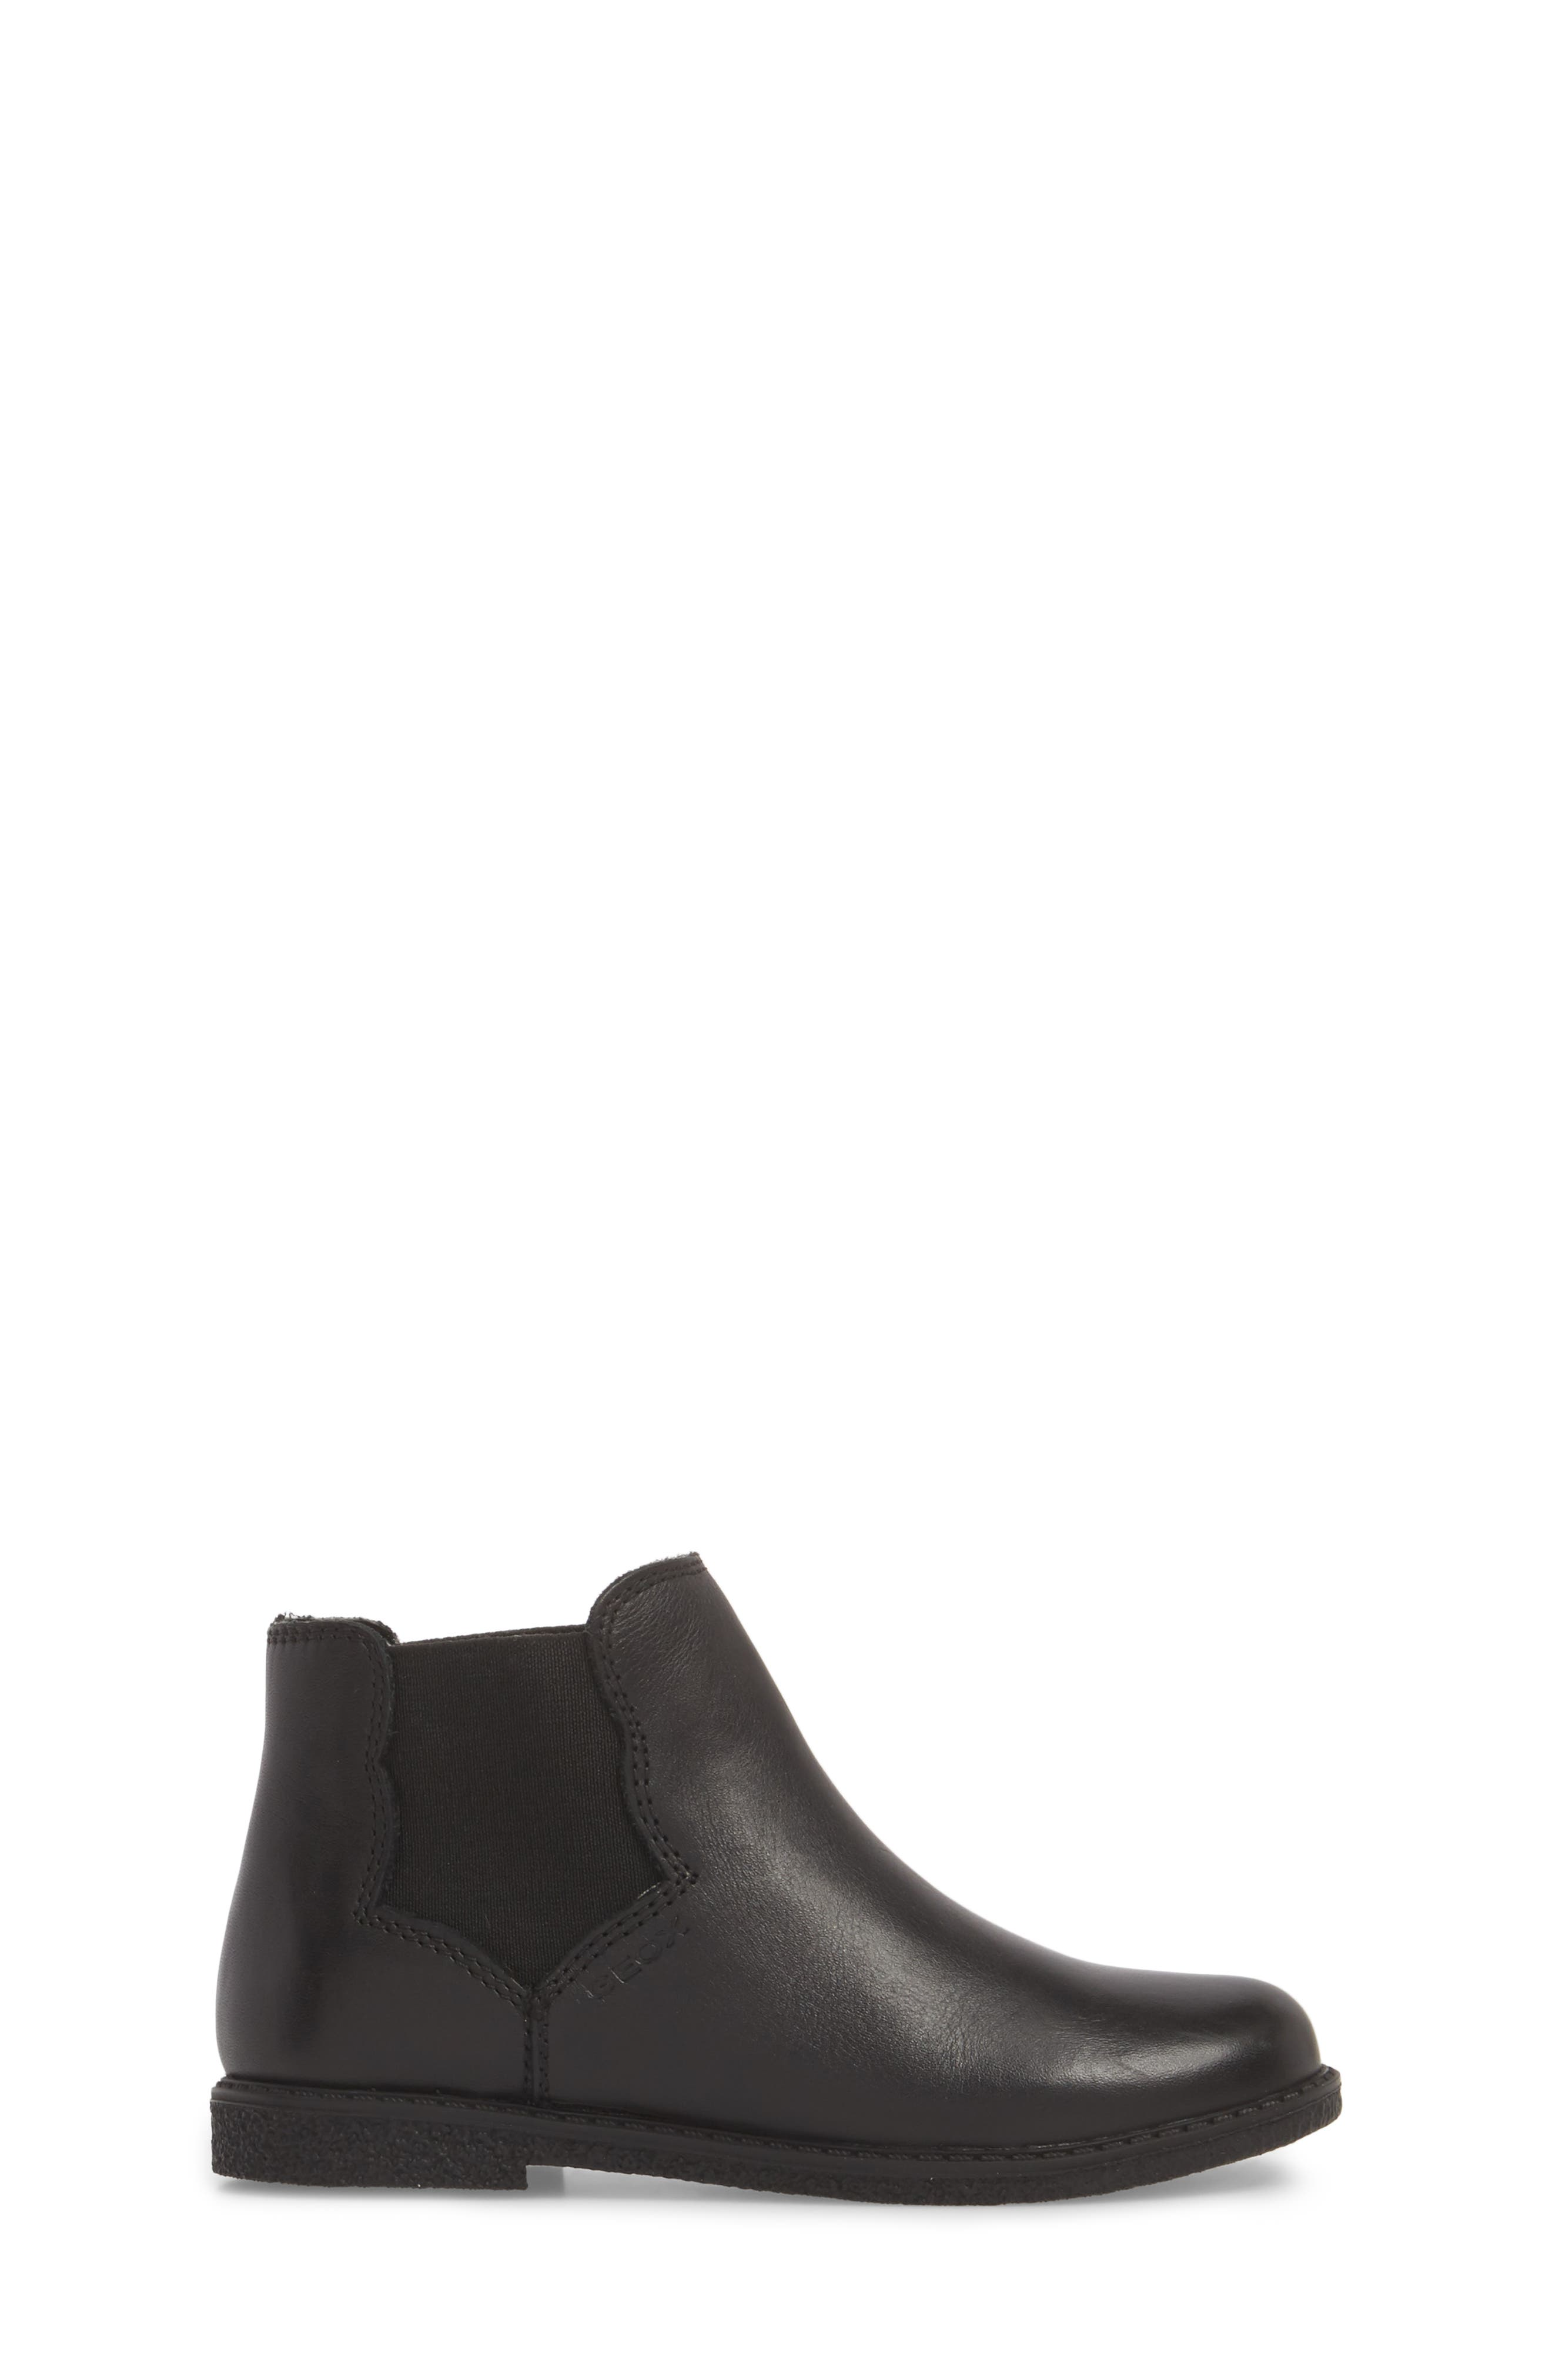 Shawntel Chelsea Boot,                             Alternate thumbnail 3, color,                             BLACK